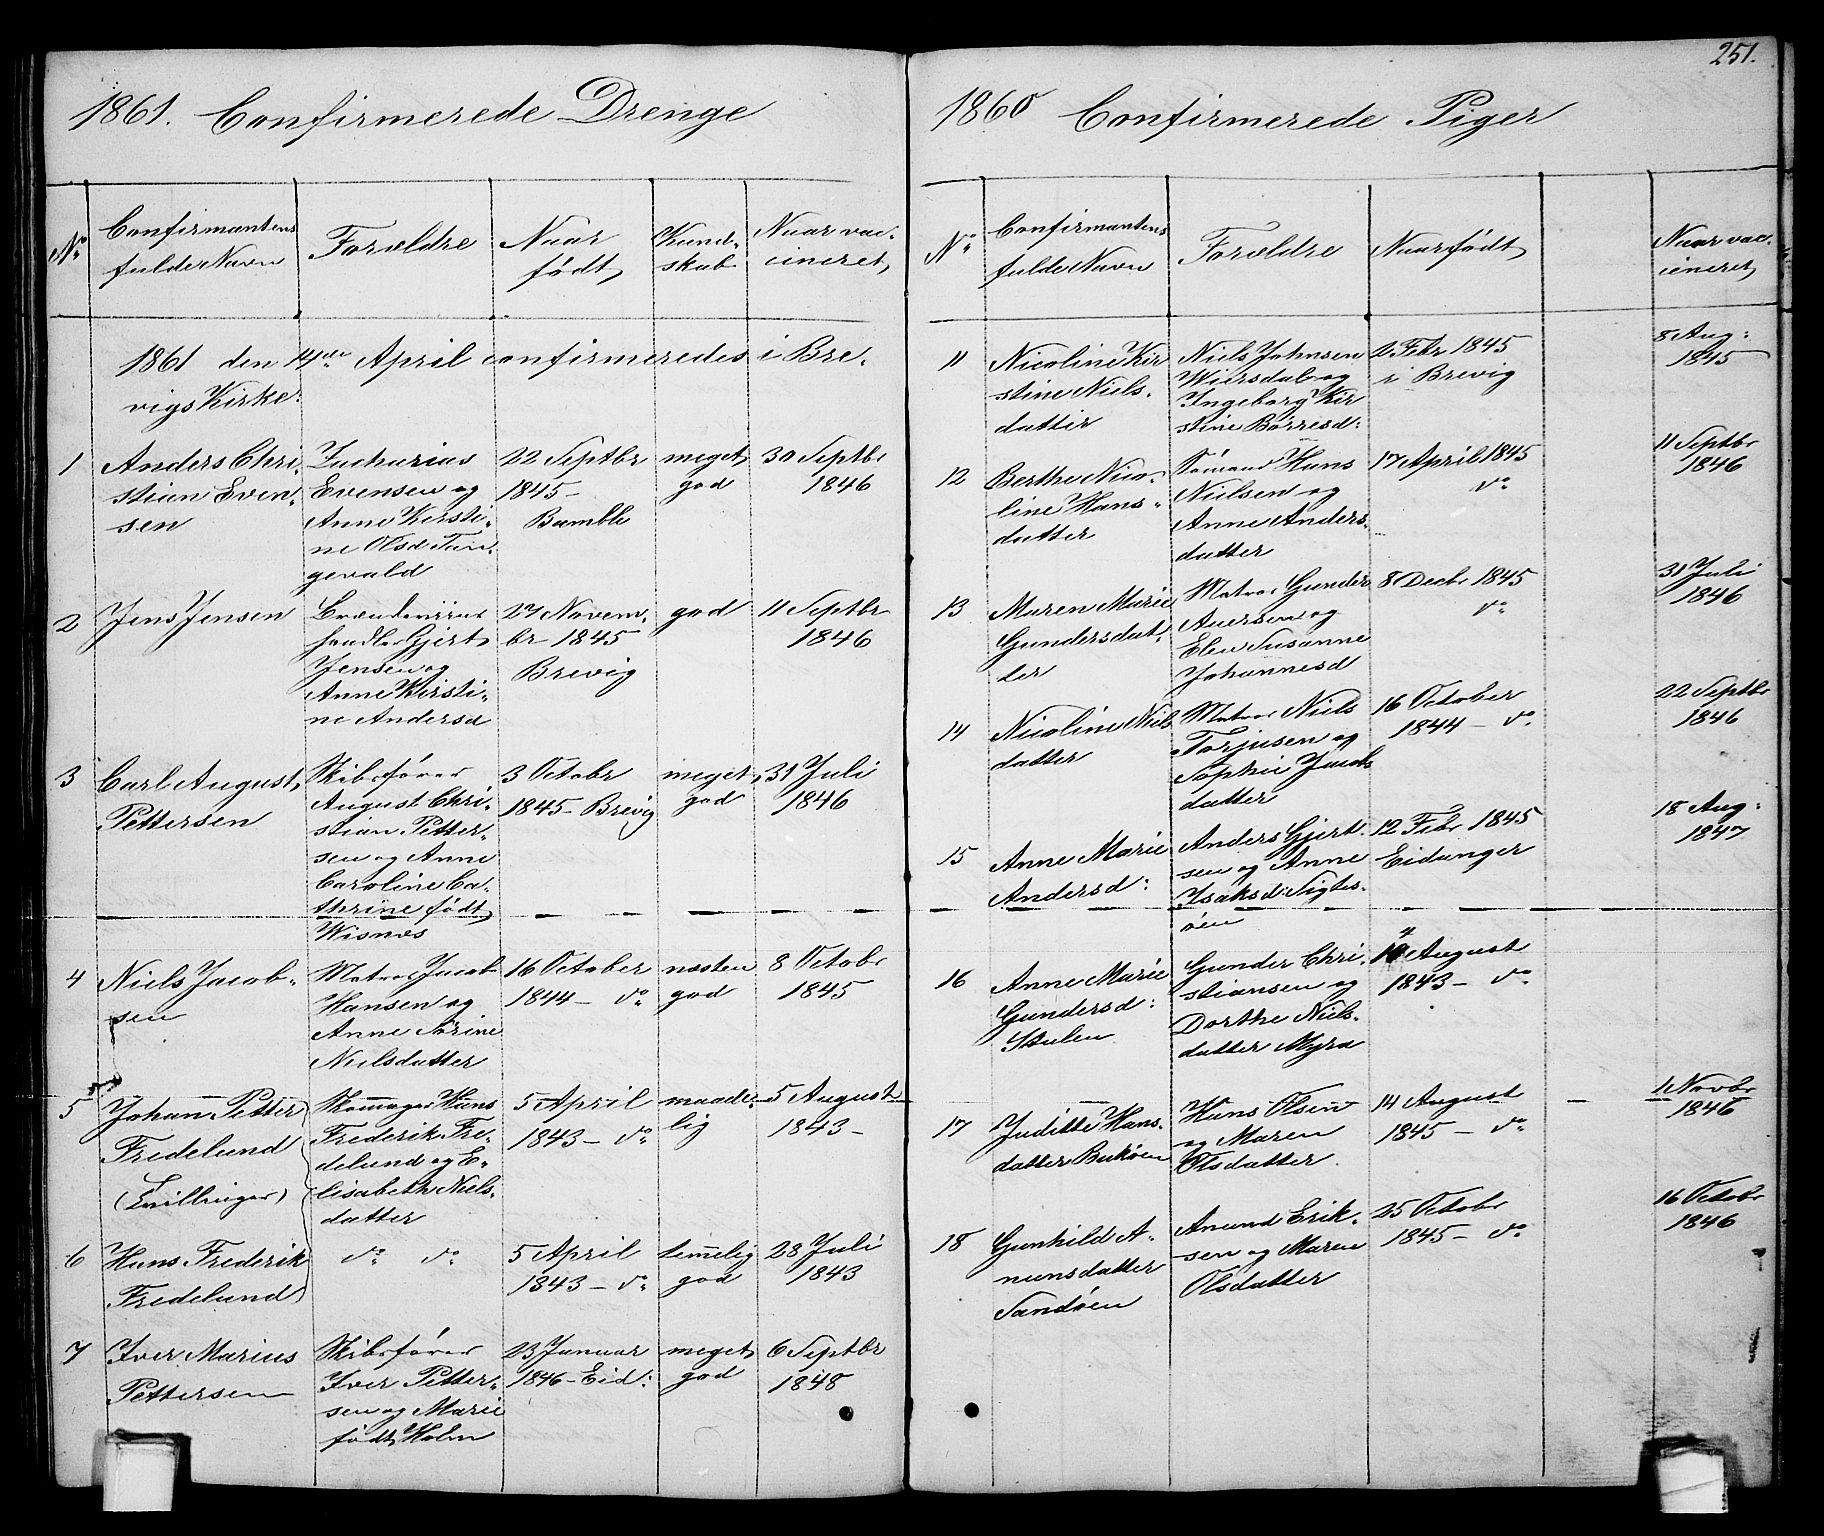 SAKO, Brevik kirkebøker, G/Ga/L0002: Klokkerbok nr. 2, 1846-1865, s. 251